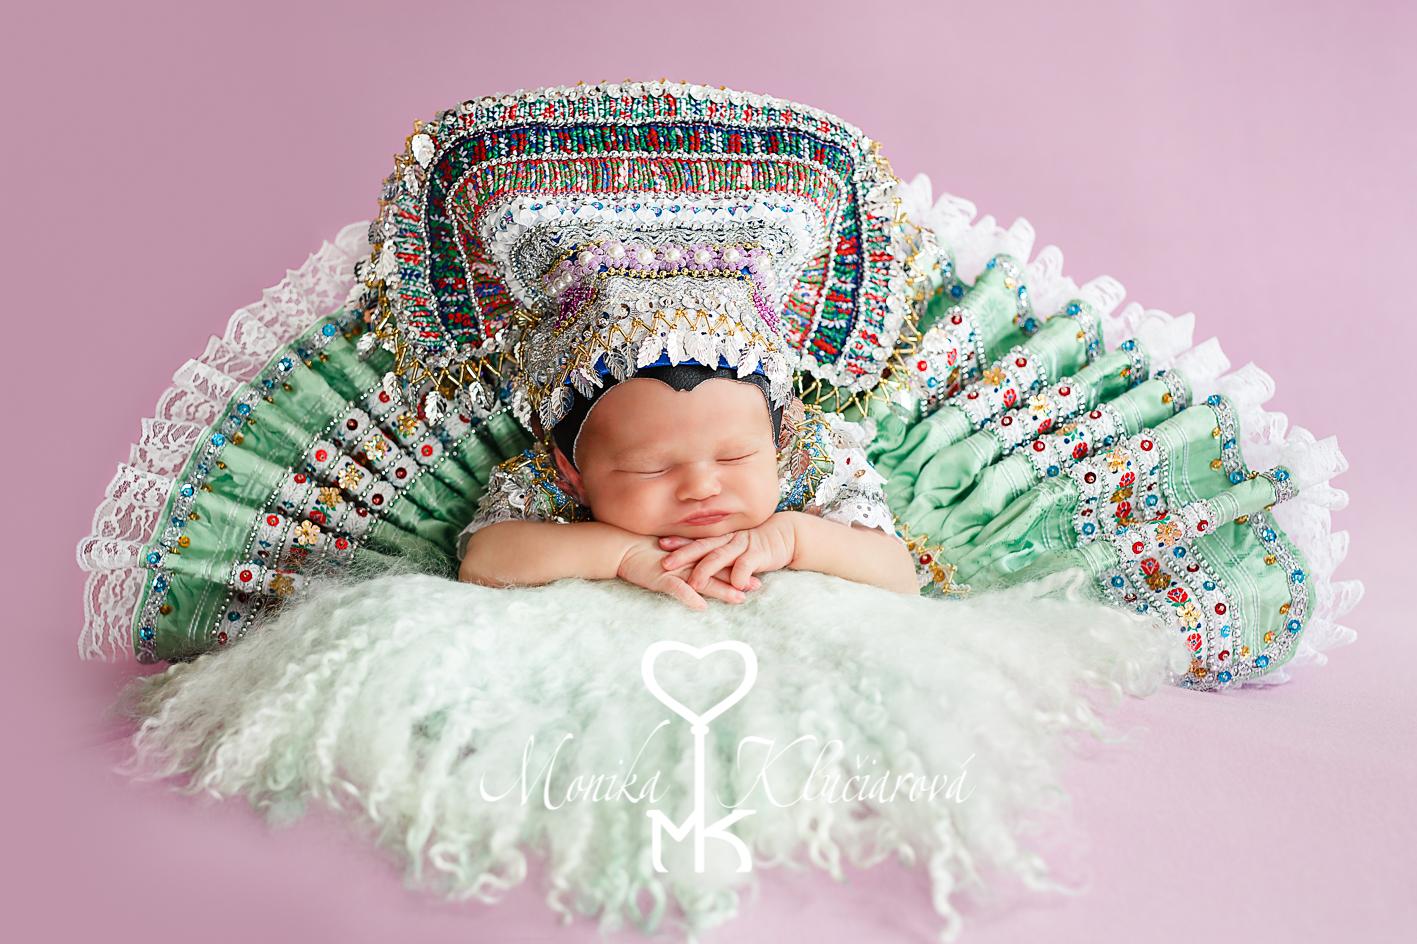 Kalendár 2018 - Krojované bábätka